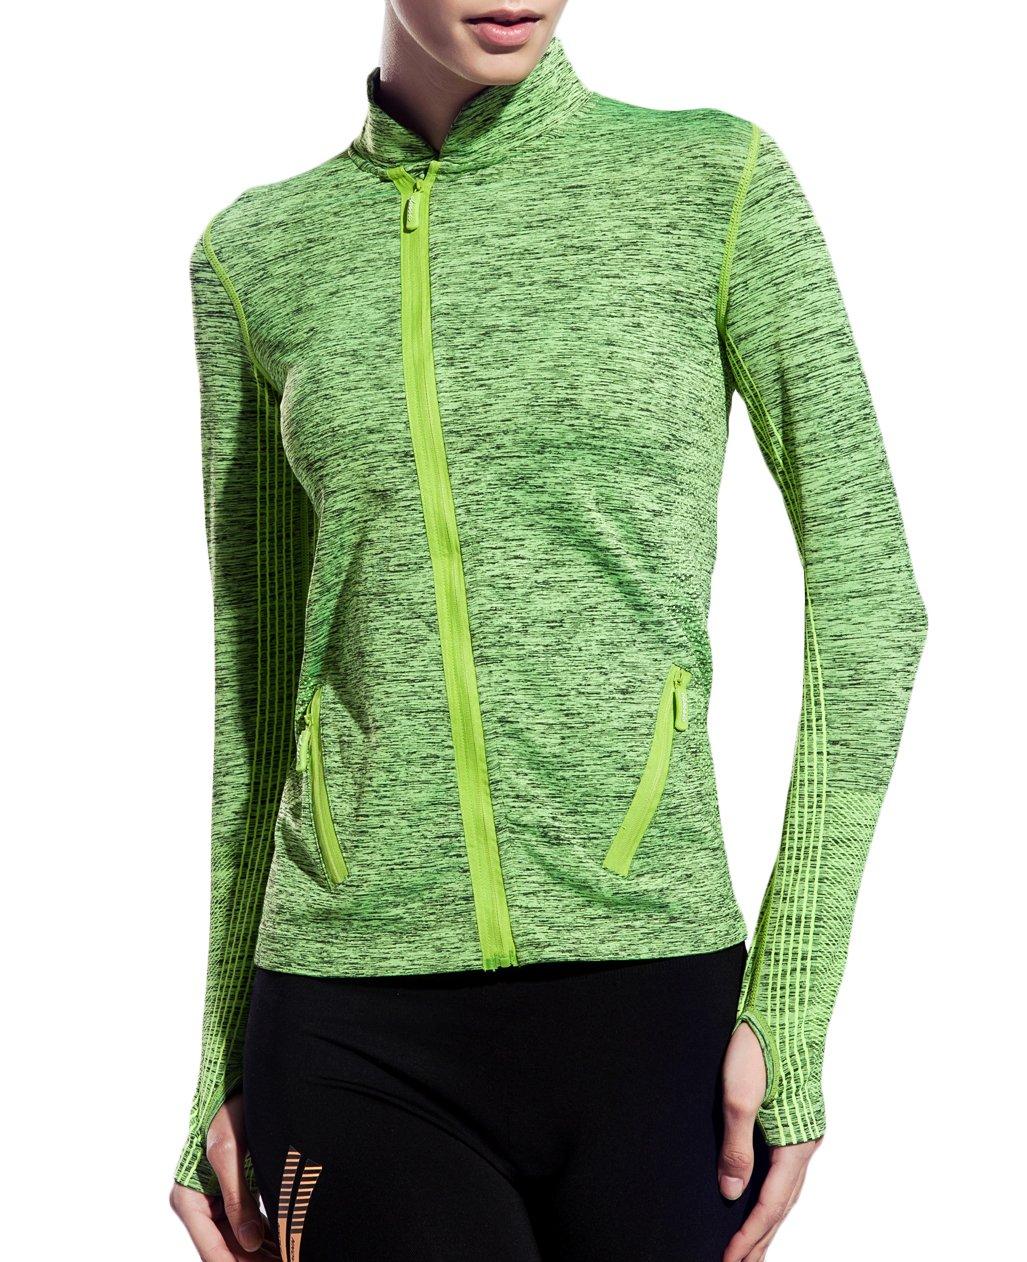 UDIY Women Athletic Sweatshirts, Full-Zip Gym Jacket Coat with Two Size Pocket,Green by UDIY